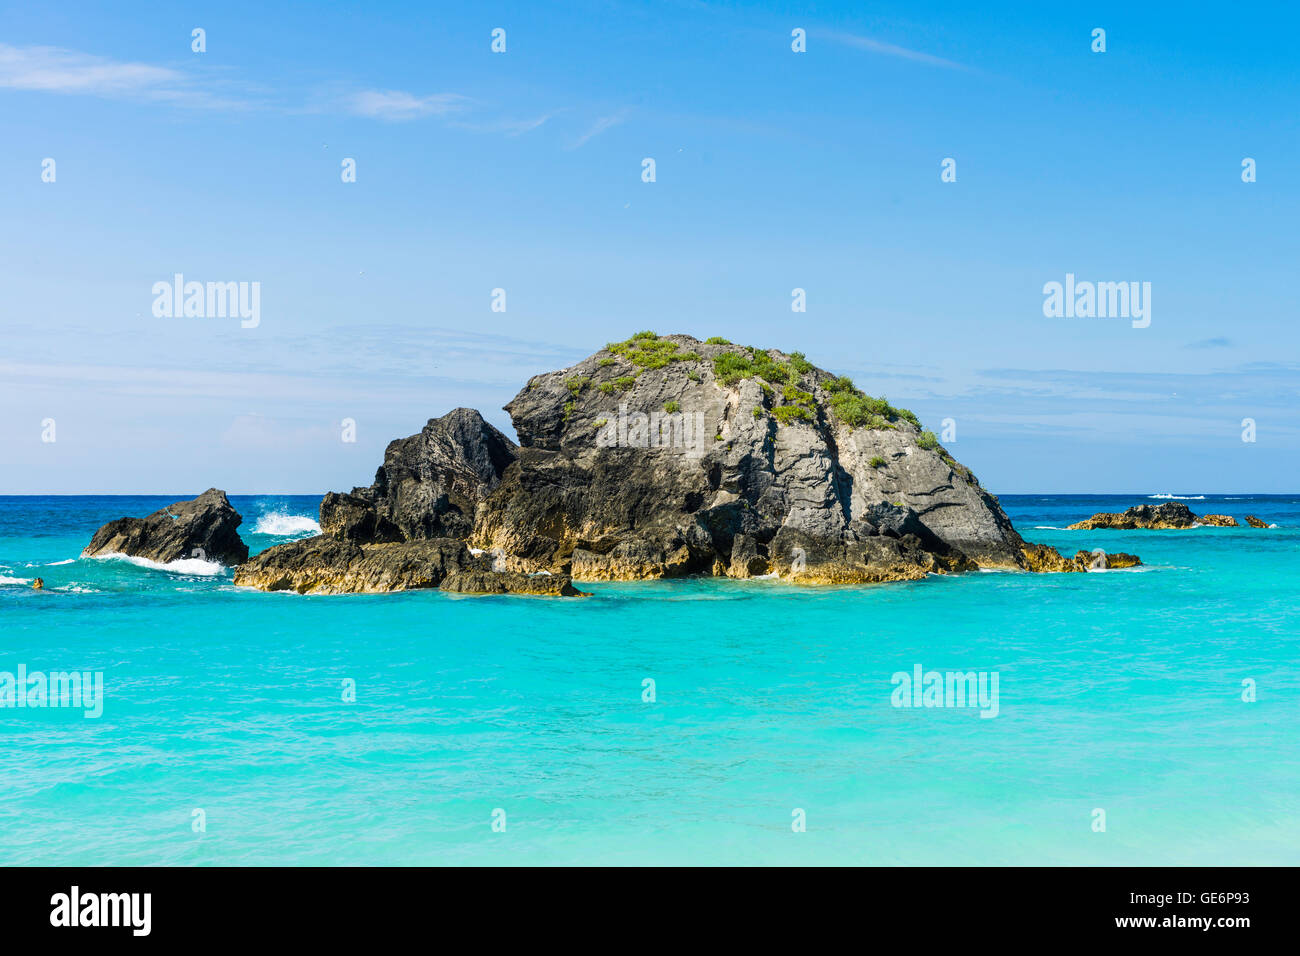 Small island off the beach club at the Fairmont Southampton luxury resort at Southampton, Bermuda - Stock Image